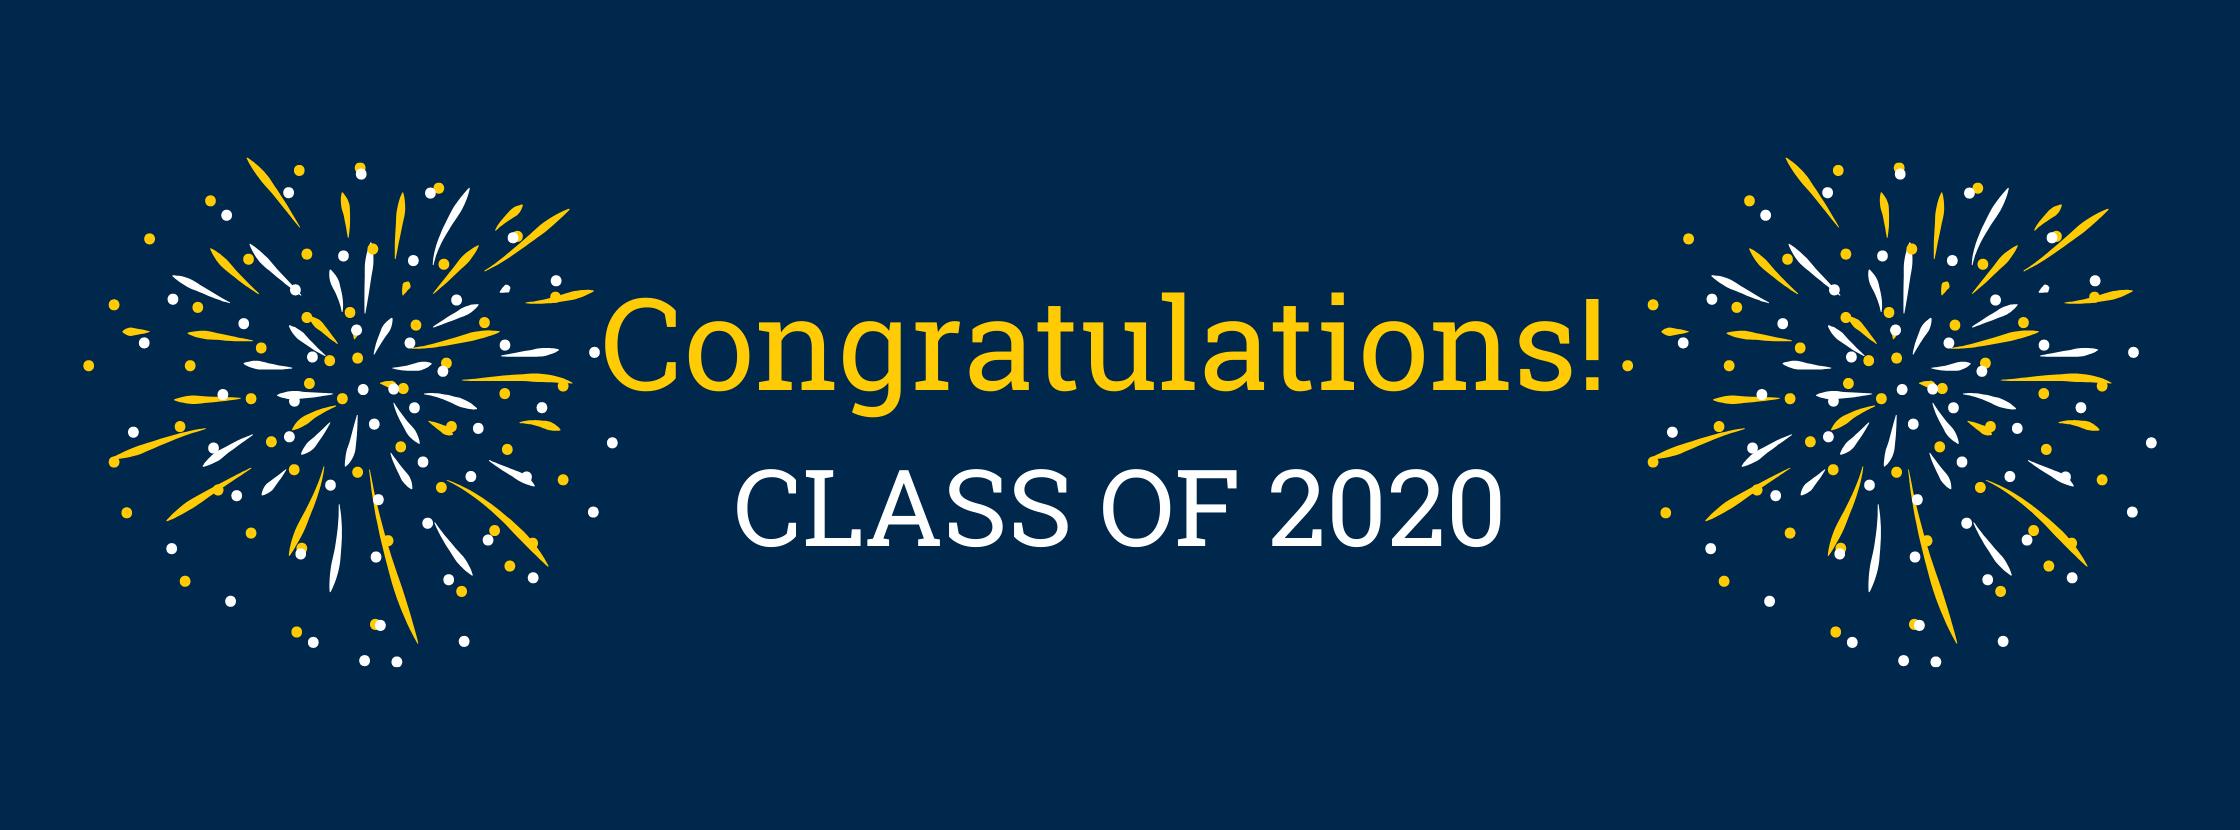 Congrats! Class of 2020